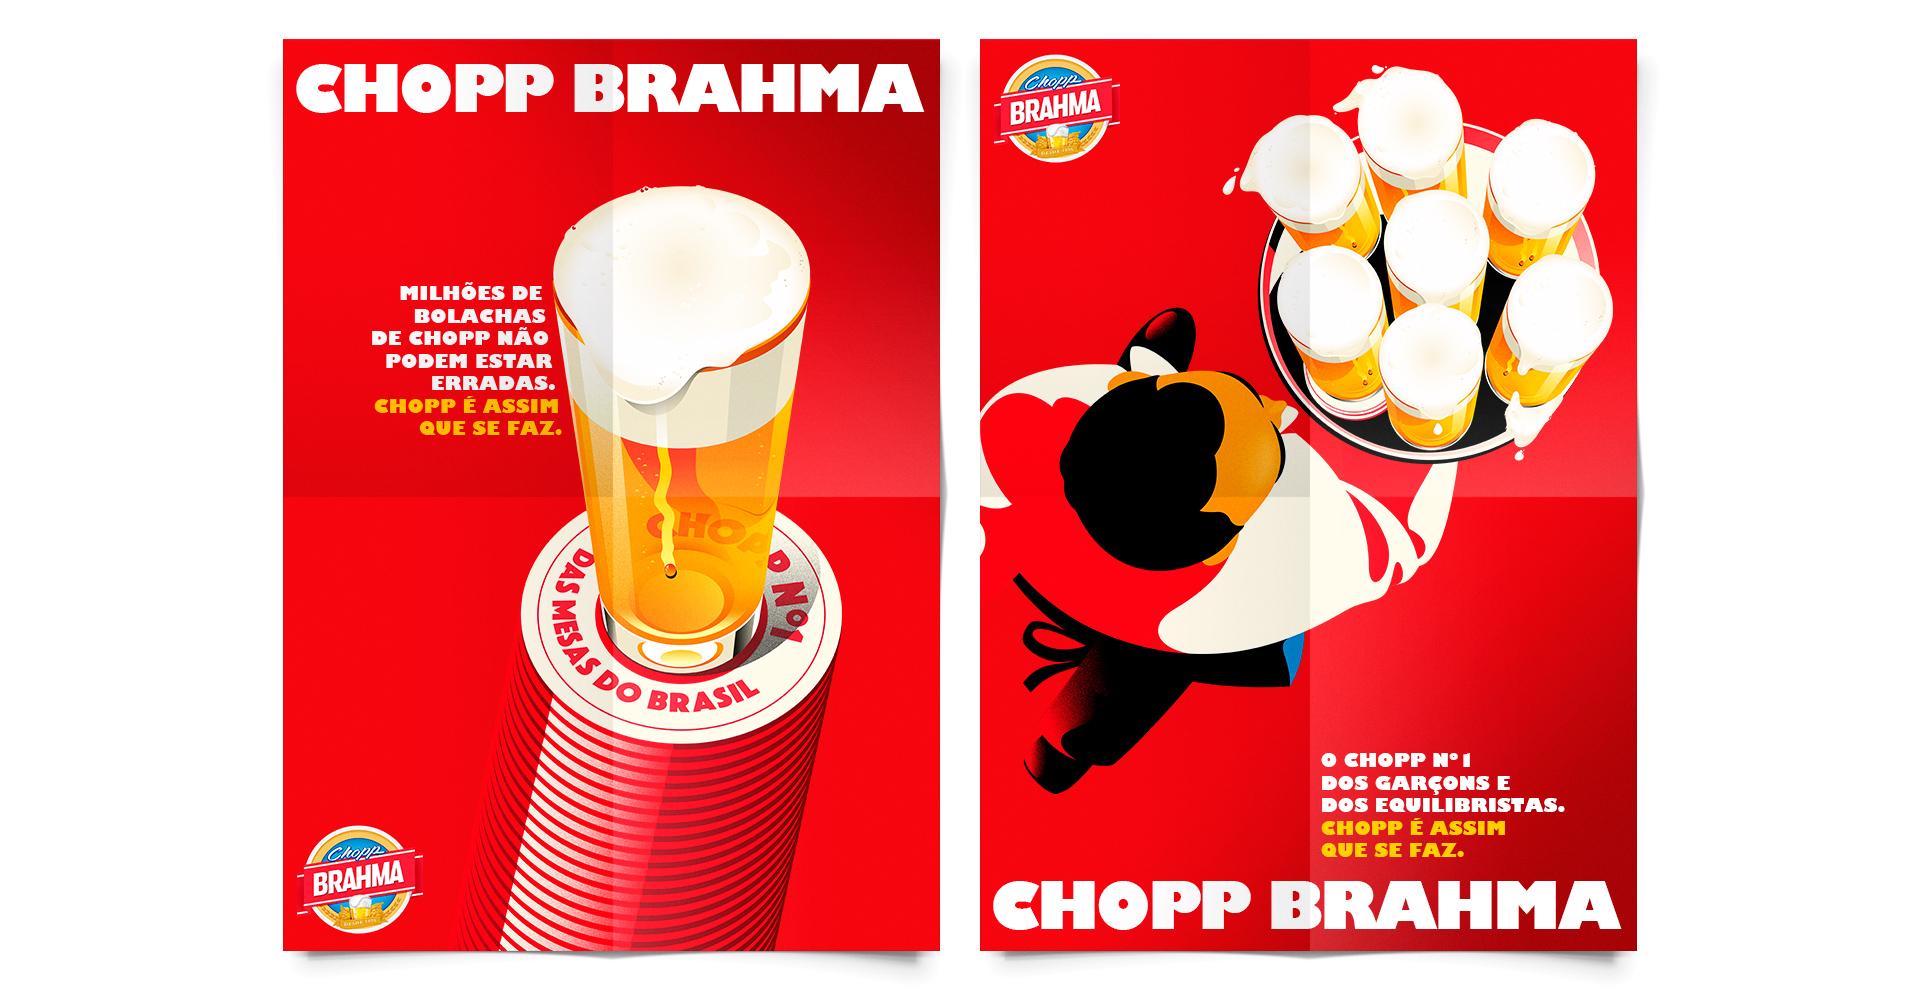 firmorama_chopp-brahma_02